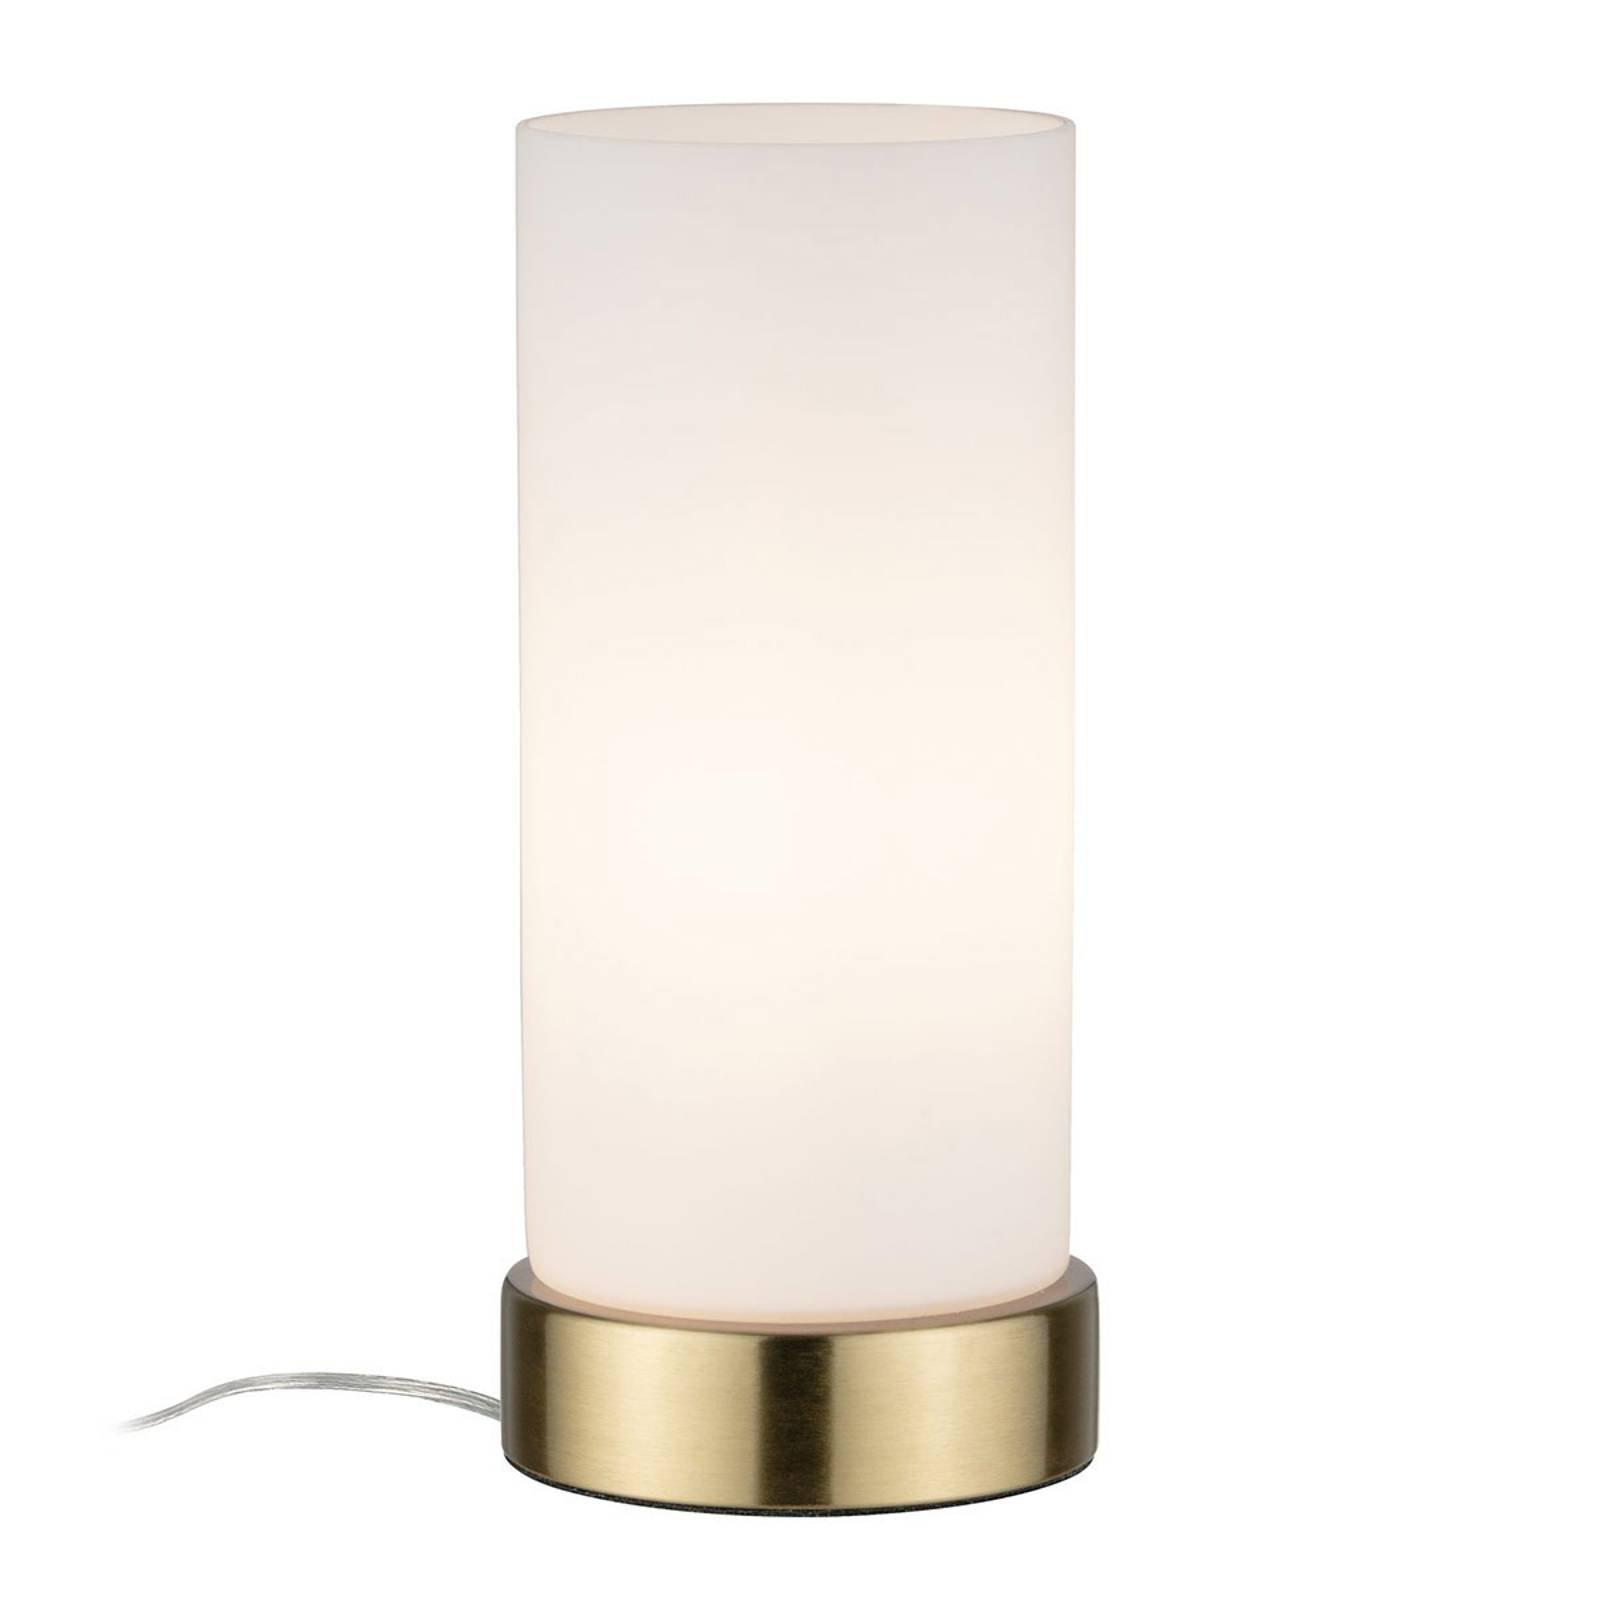 Paulmann bordlampe Pinja messing/opal